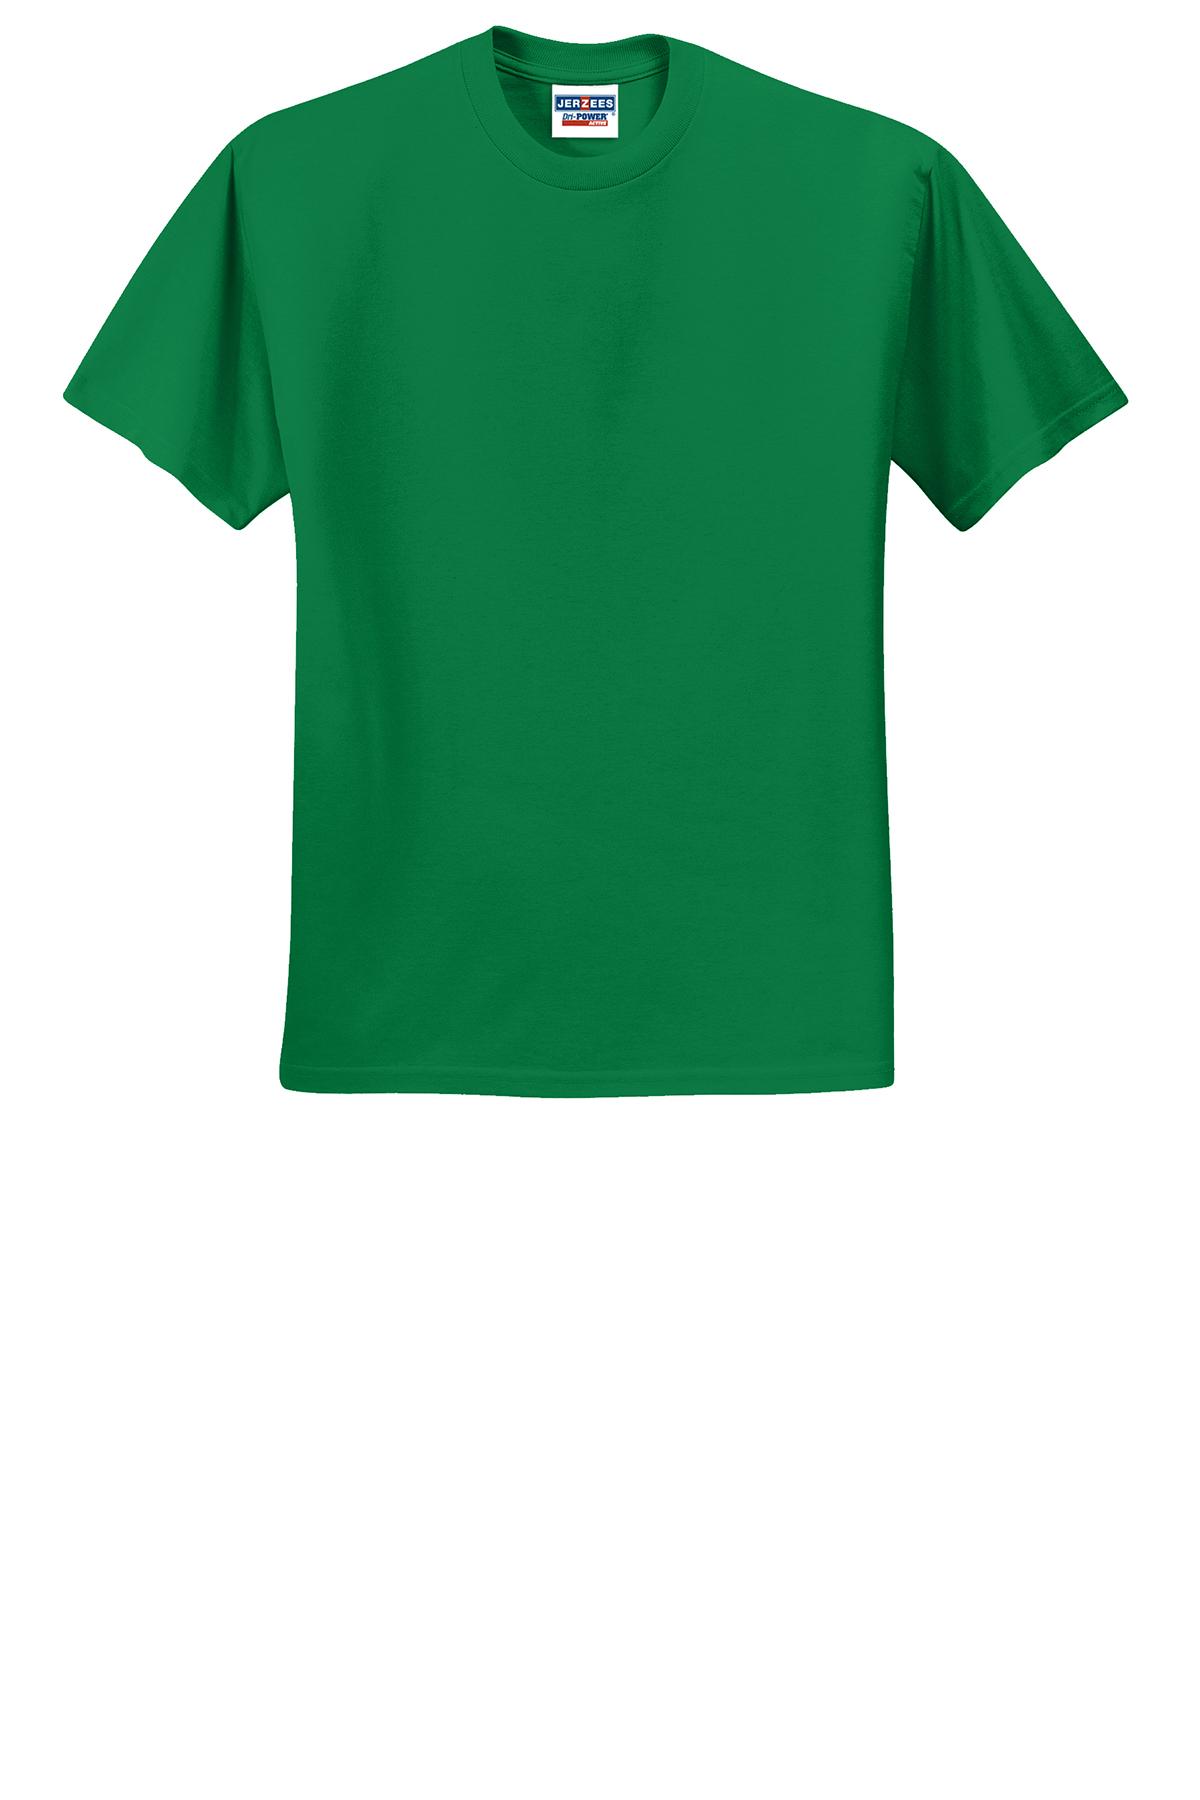 JERZEES® Dri Power® Active 5050 CottonPoly T Shirt | 50